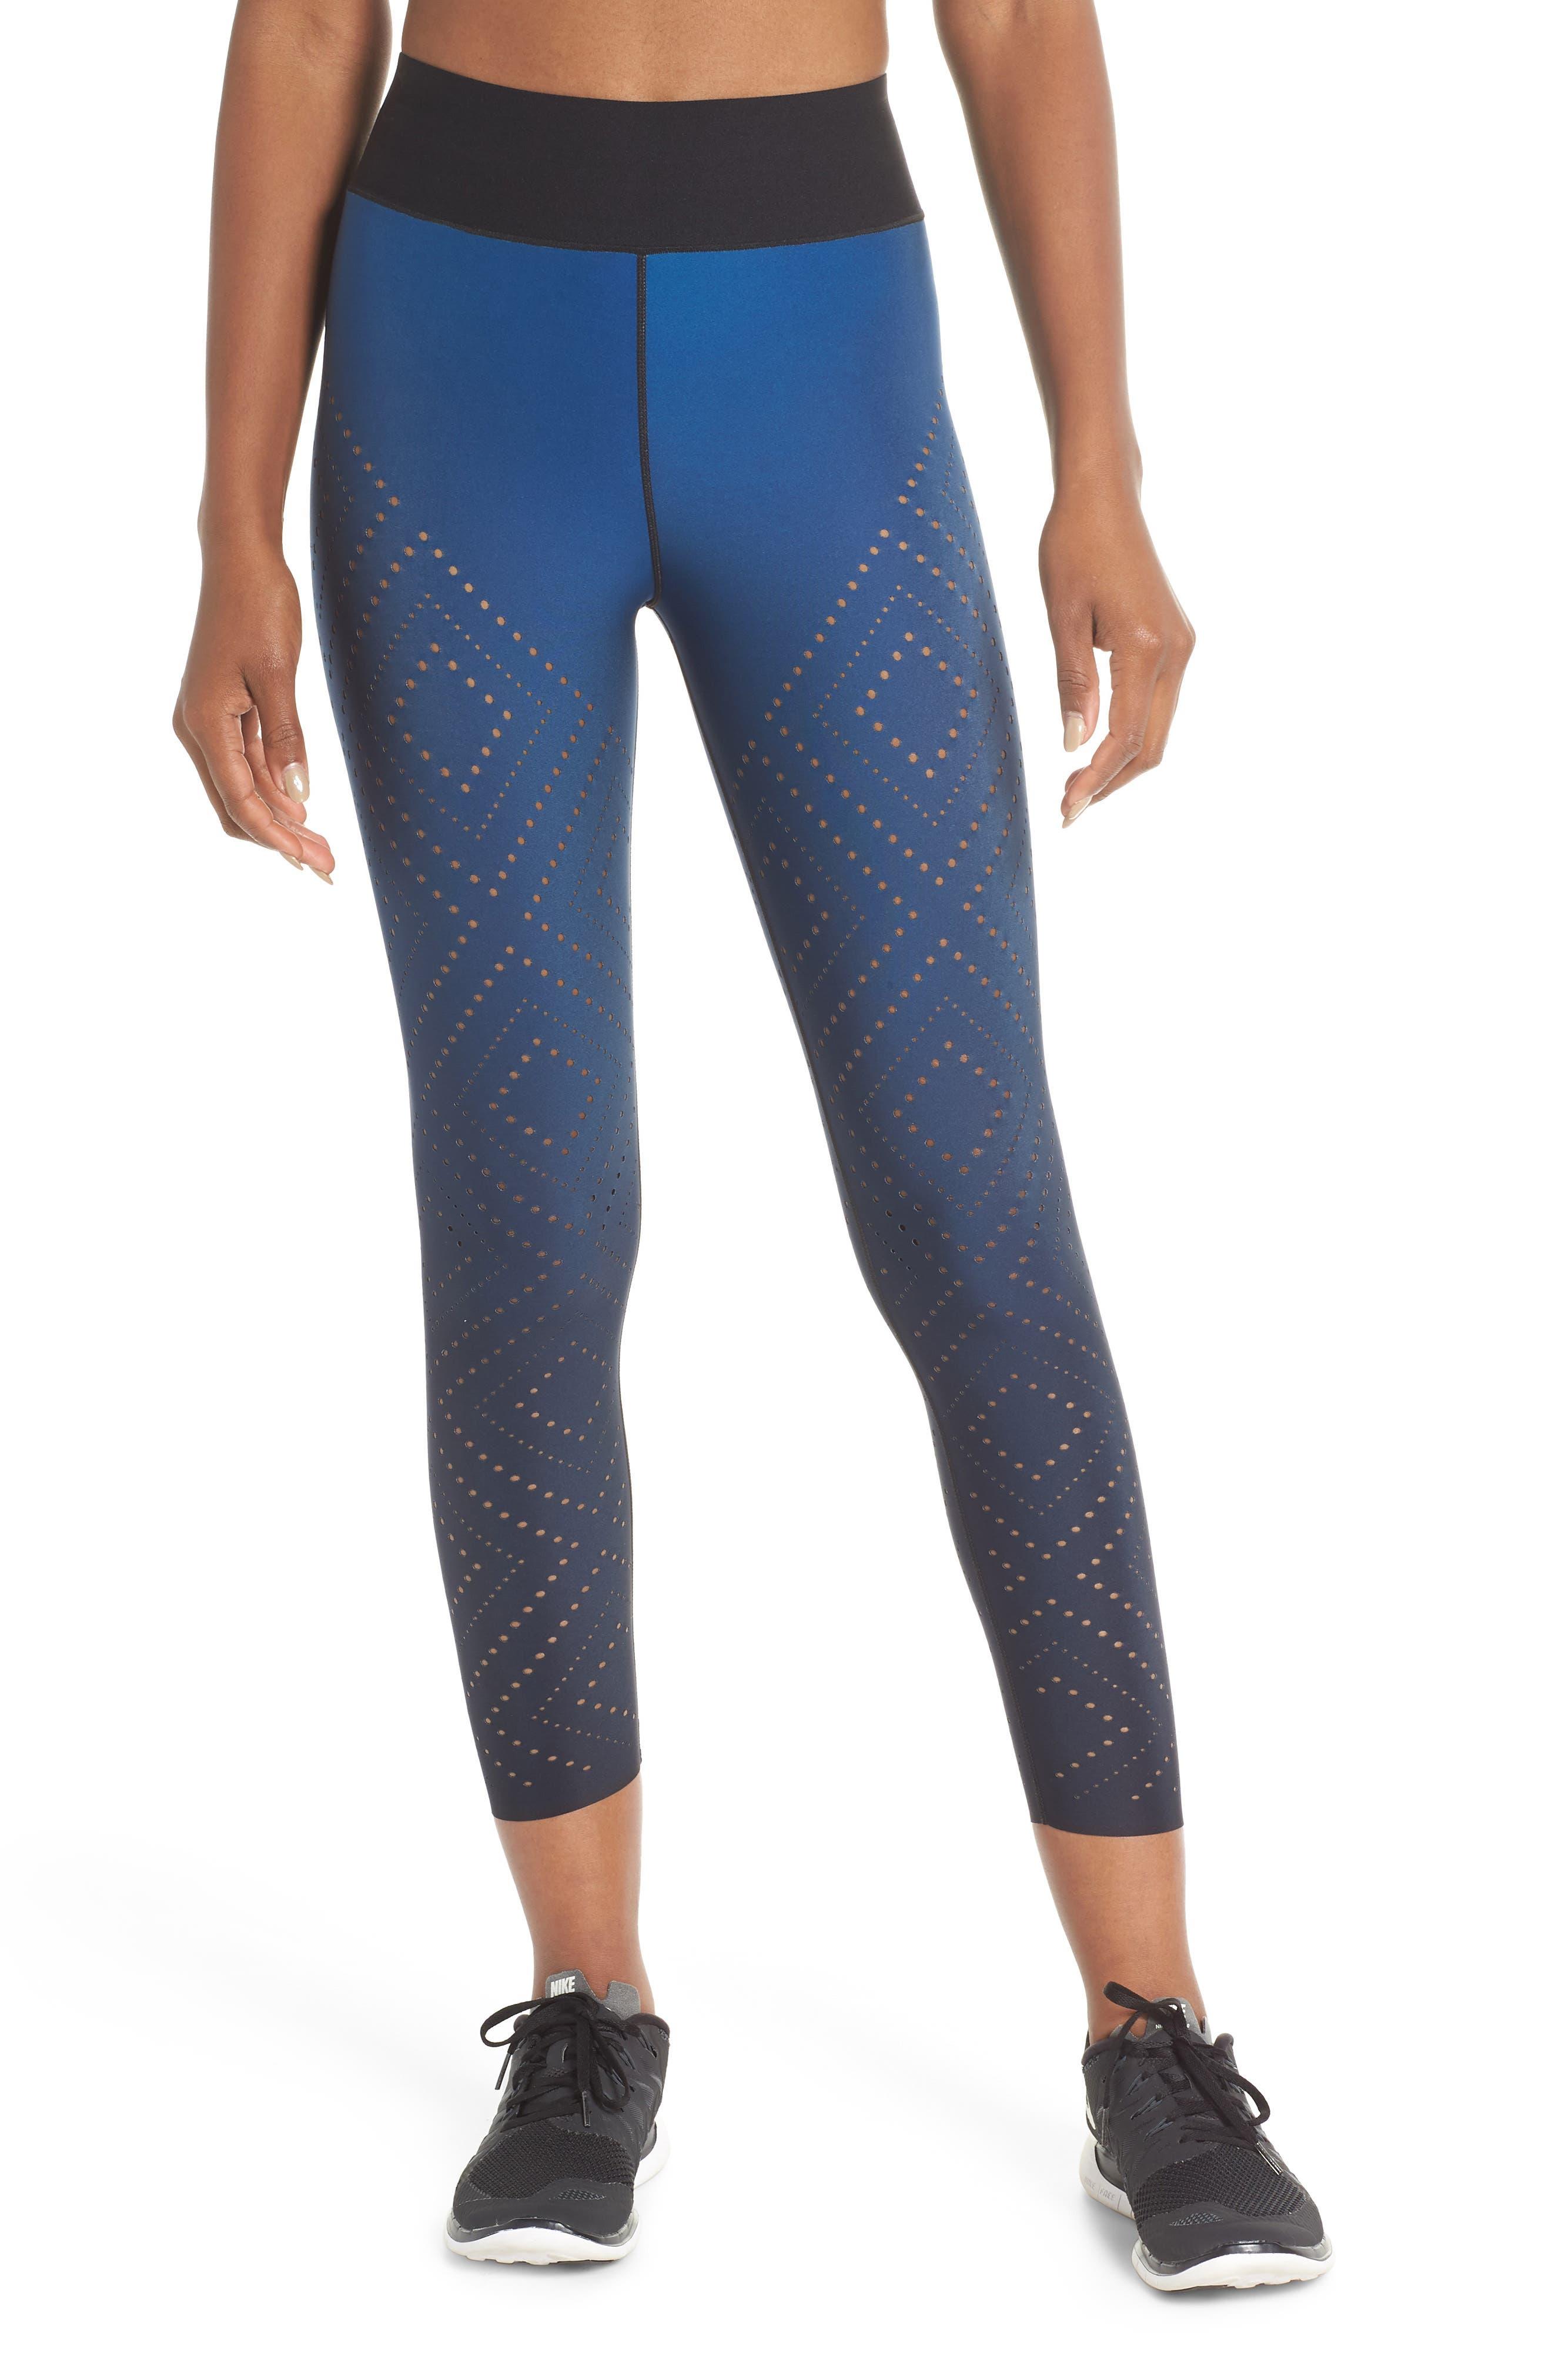 Sprinter High Argyle Pixelate Leggings,                             Main thumbnail 1, color,                             GRADIENT SAPPHIRE